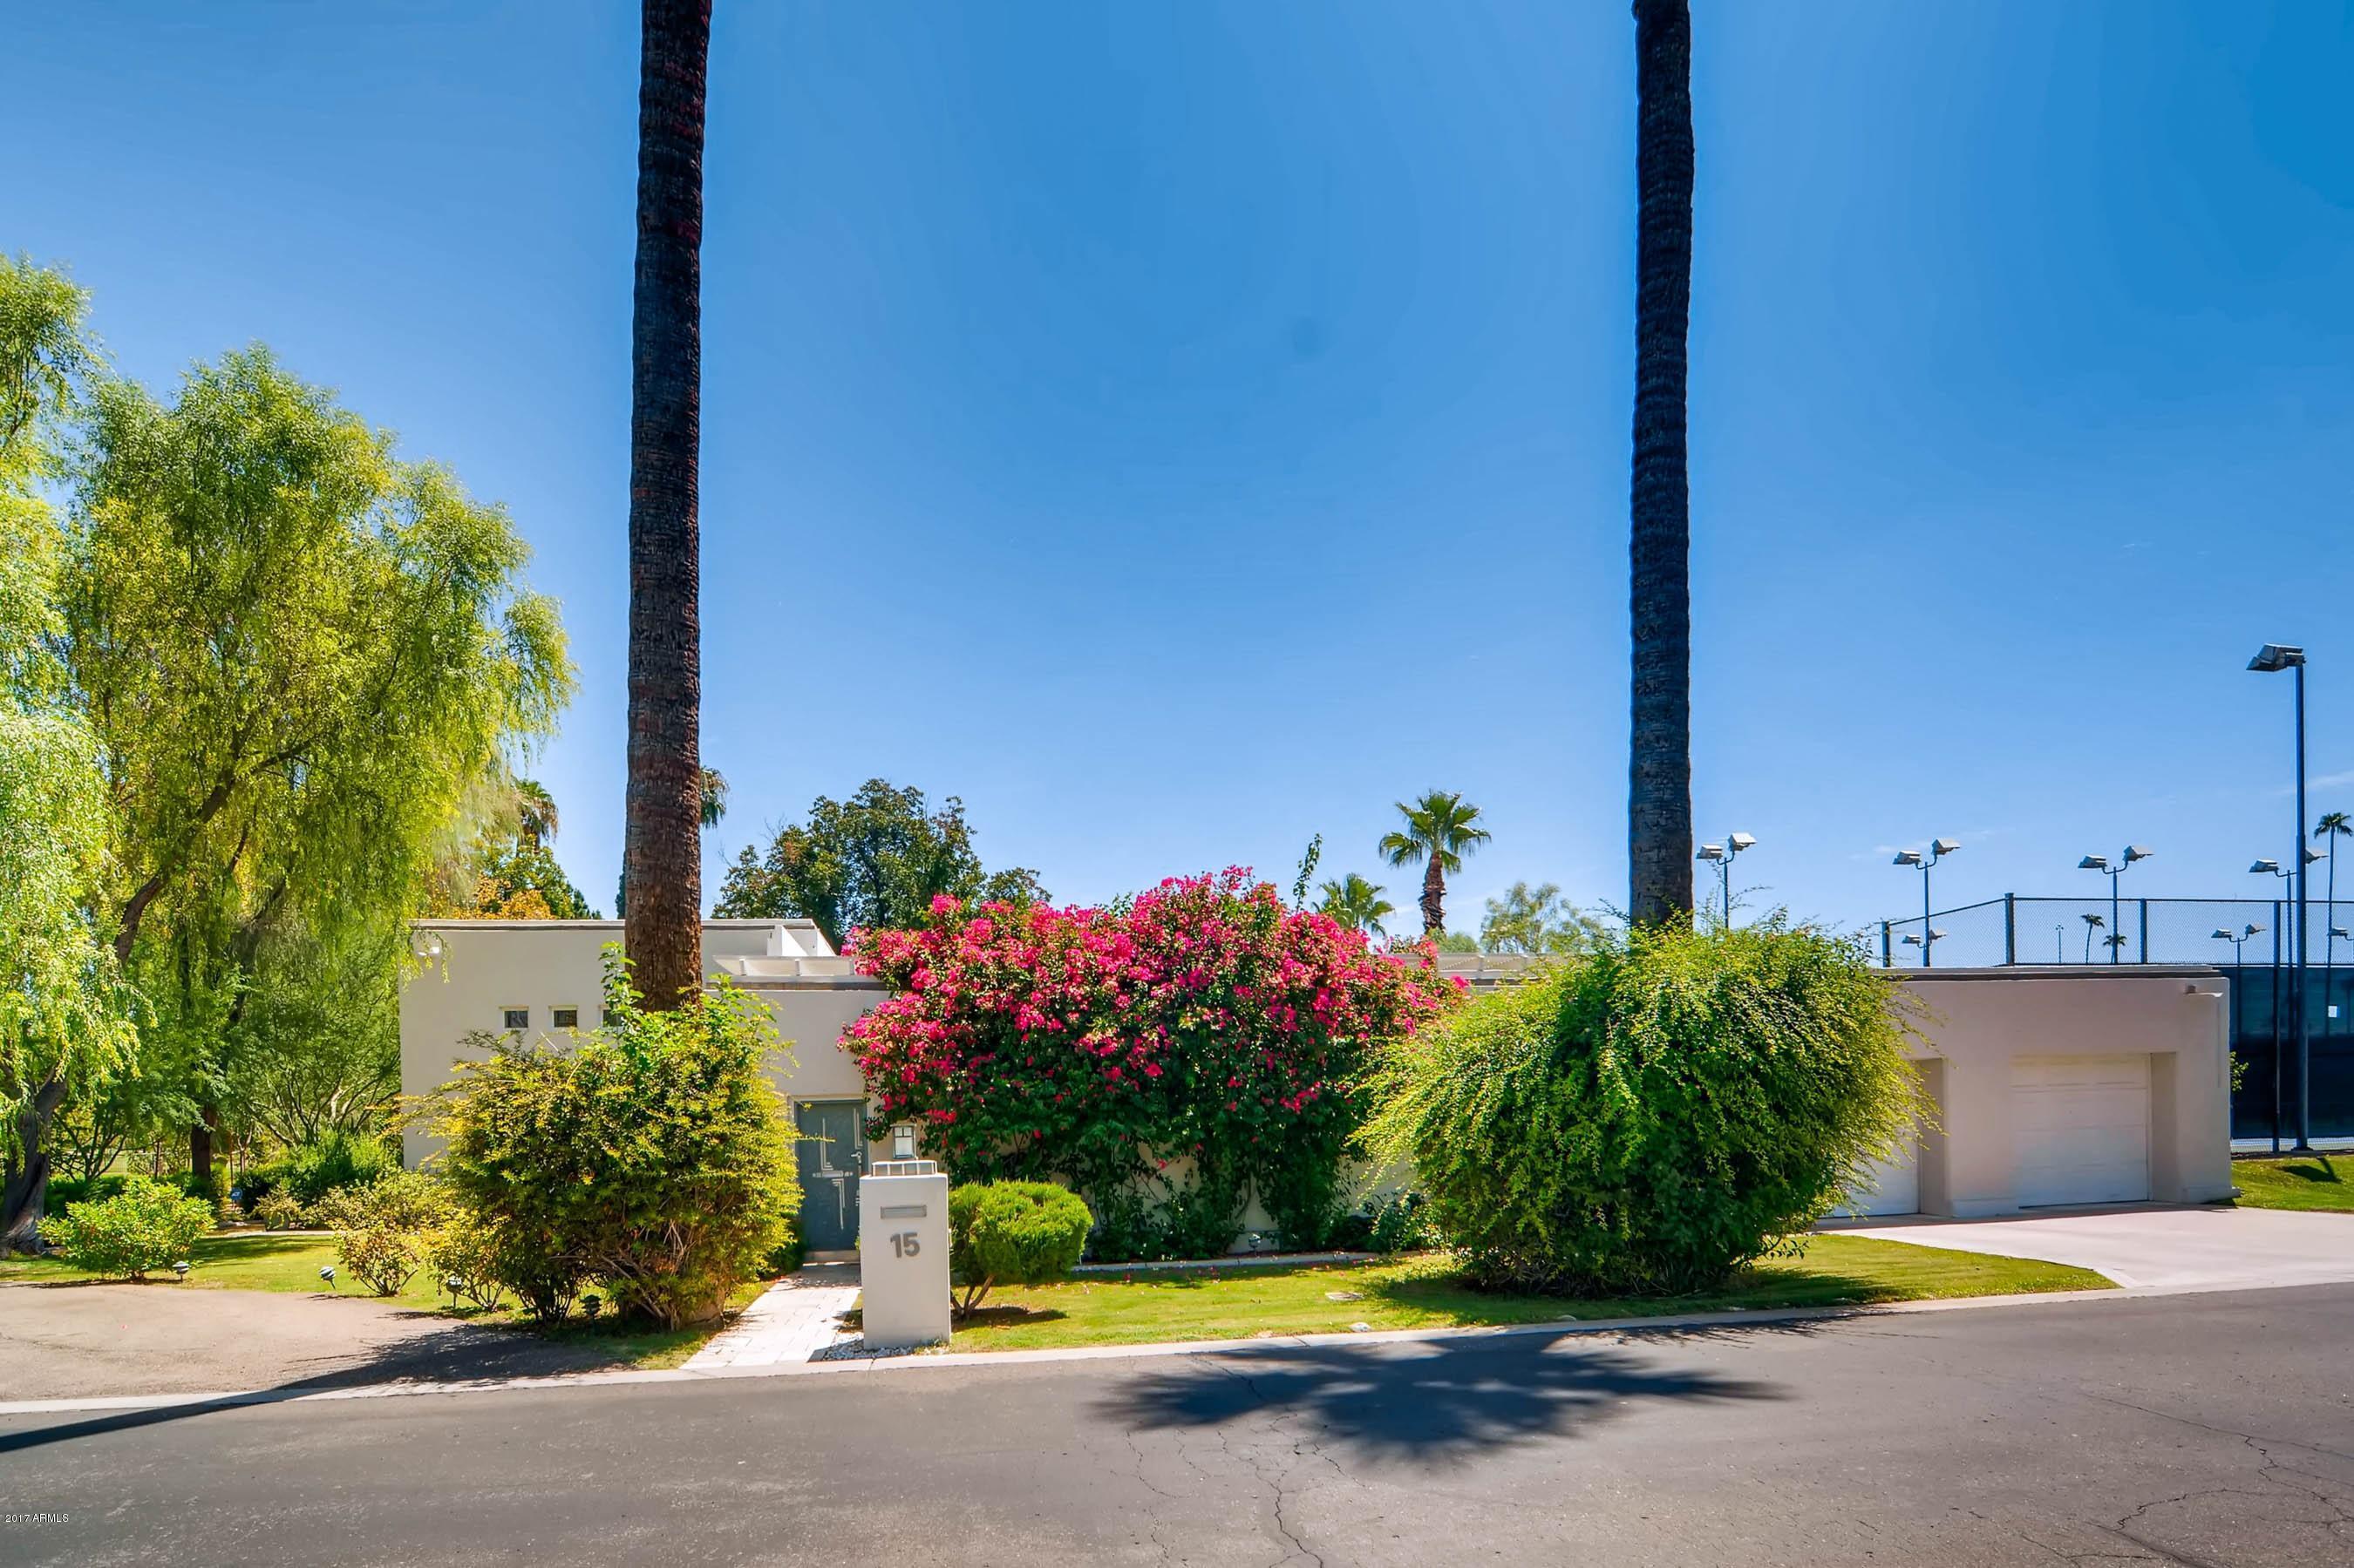 15 N COUNTRY CLUB Drive, Phoenix, AZ 85014